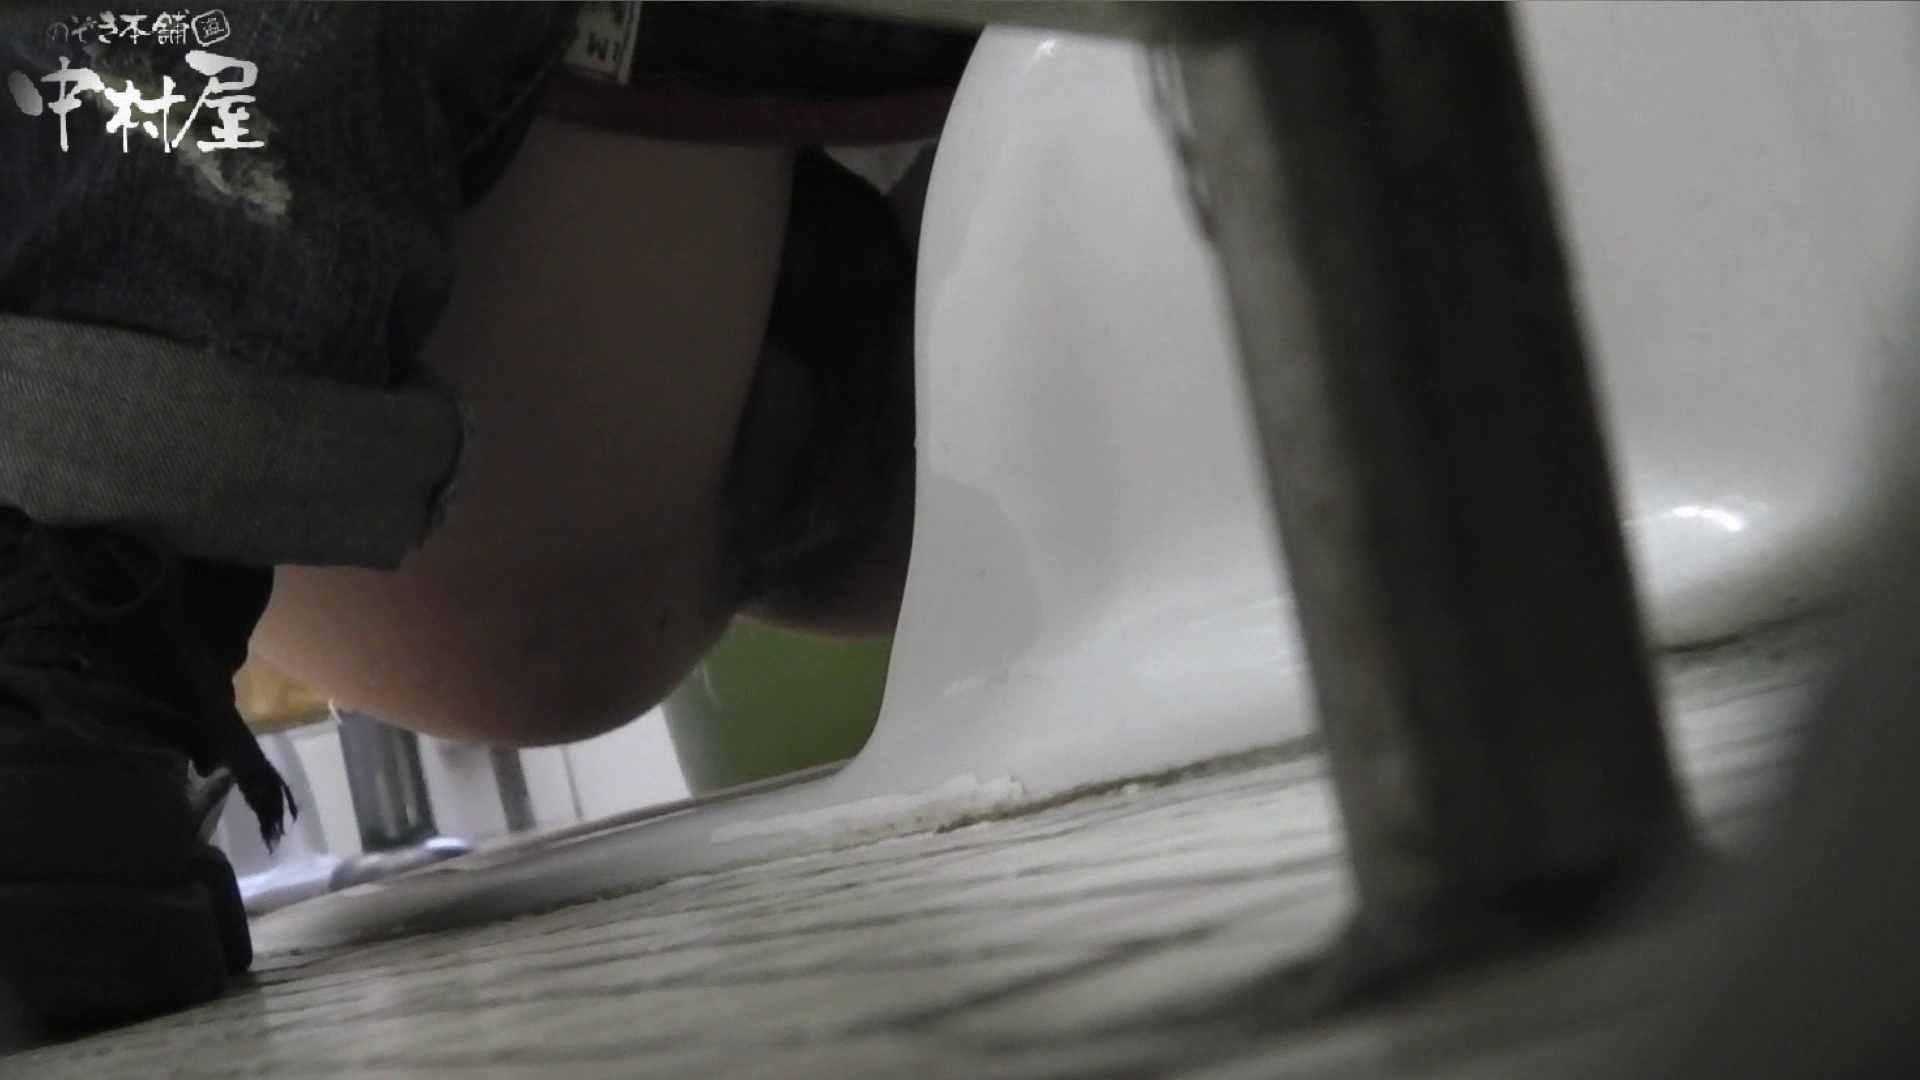 vol.01 命がけ潜伏洗面所! スニーカーブリブリ! 潜入 オメコ無修正動画無料 111PIX 98